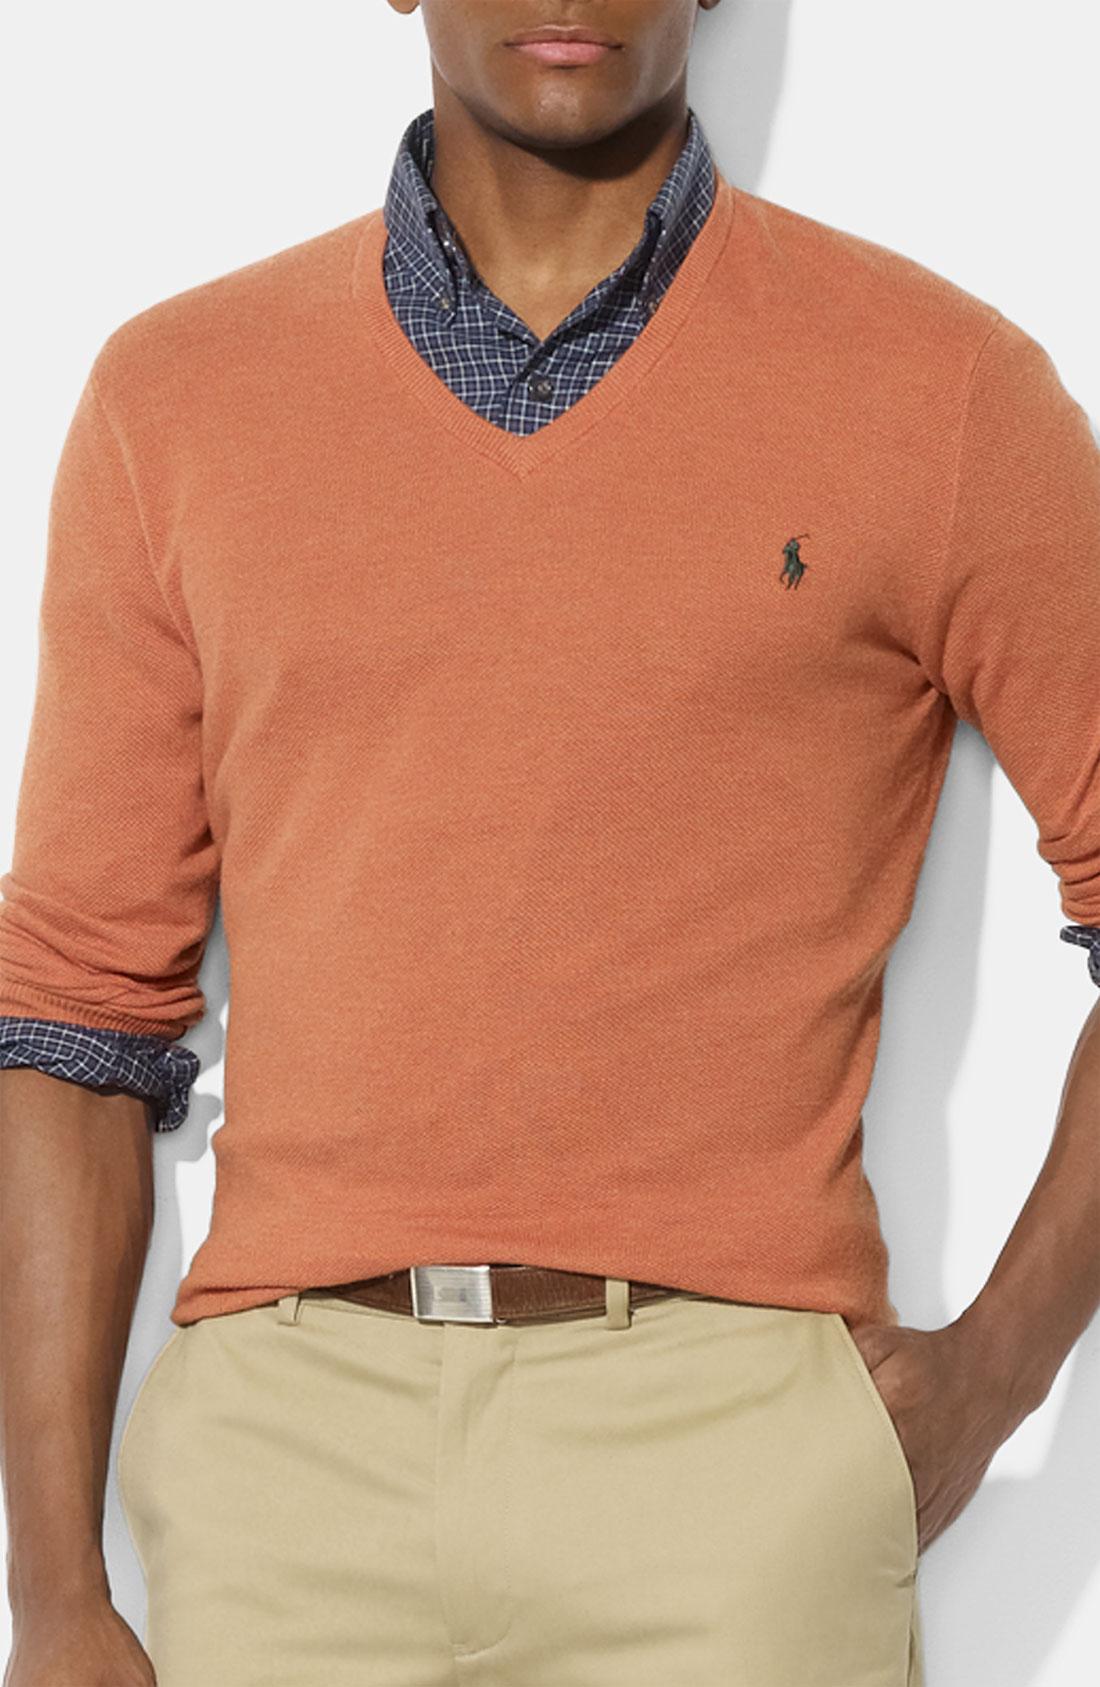 cashmere xxx sweater mens jpg 422x640